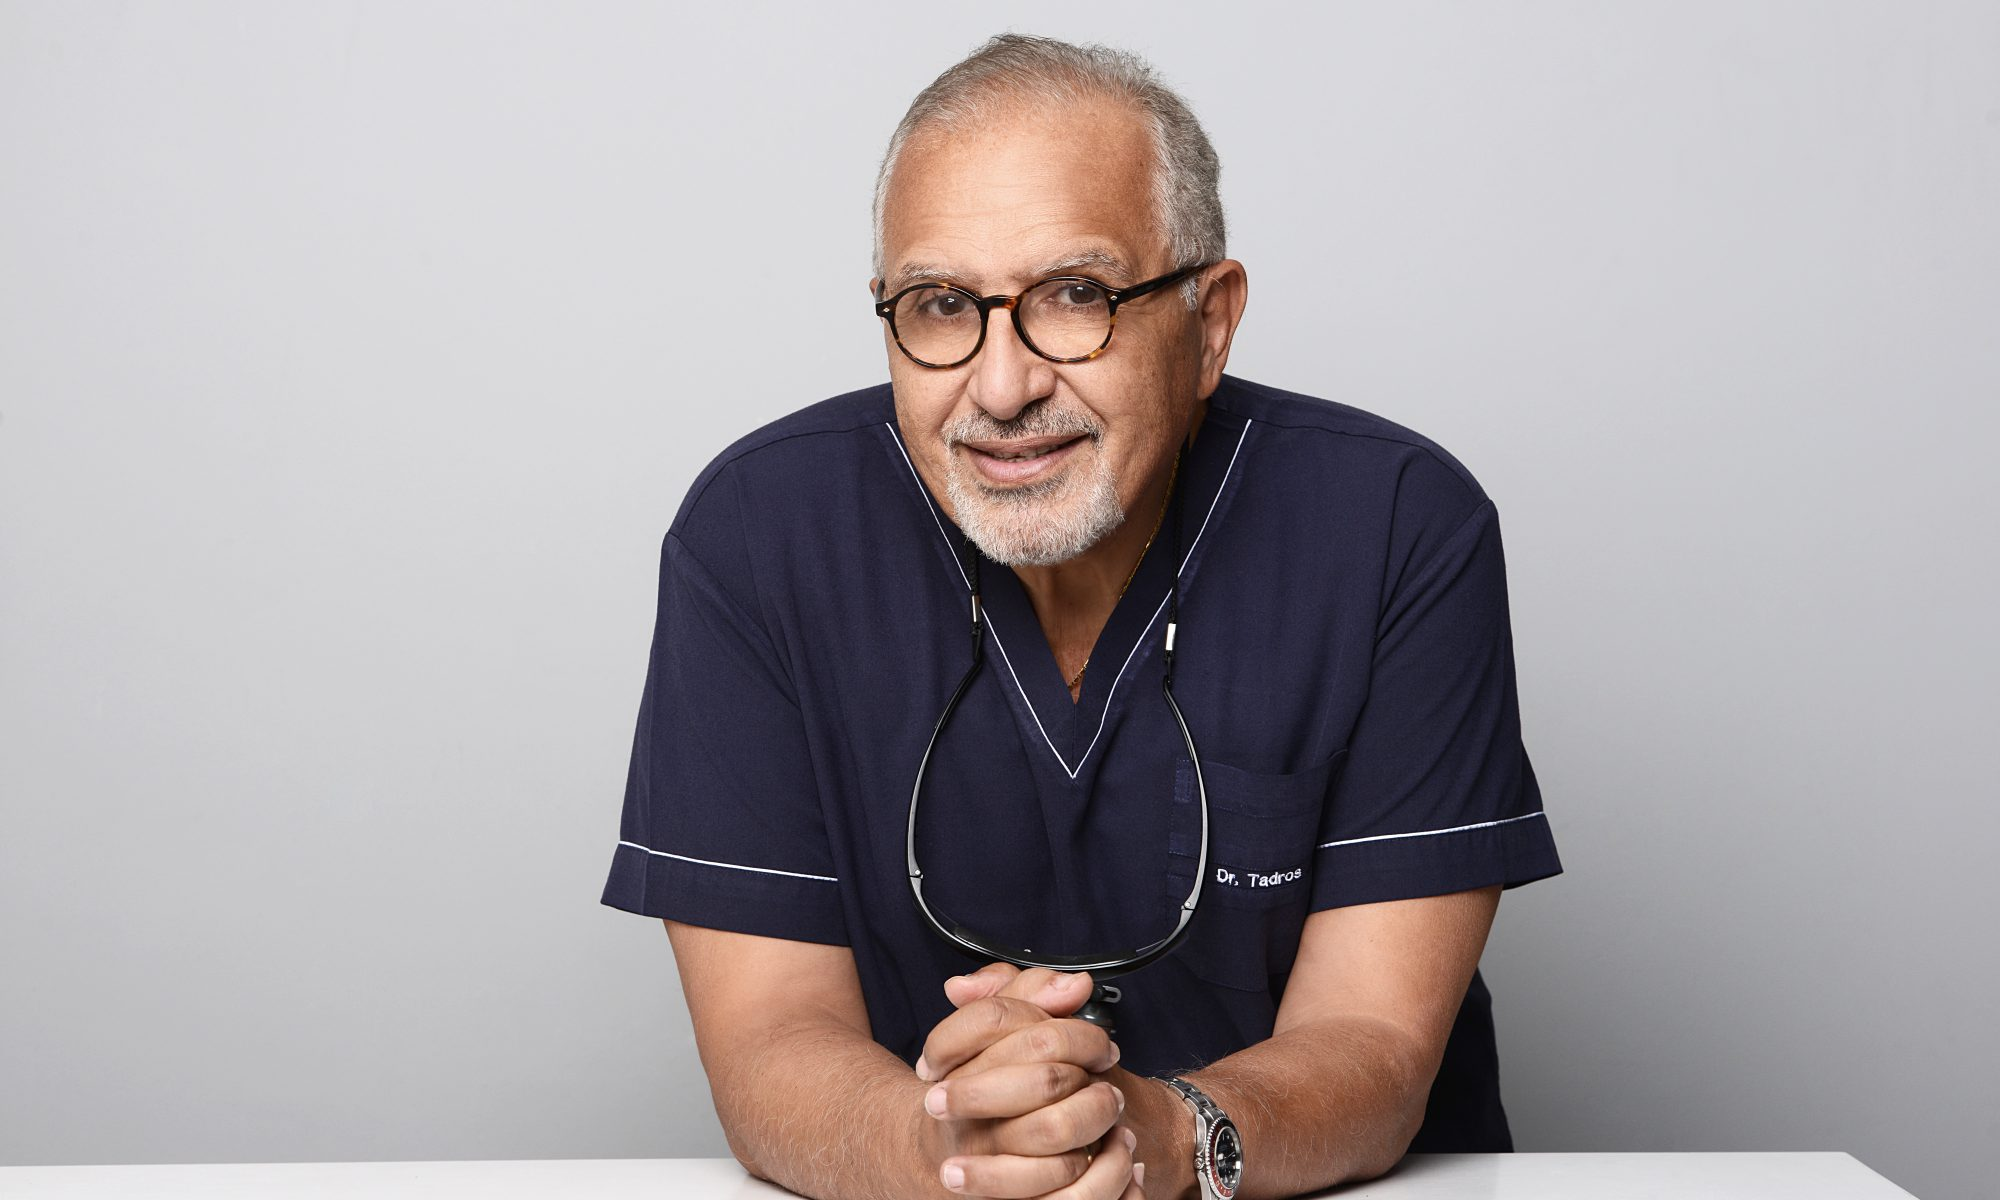 Dr. Faheem Tadros